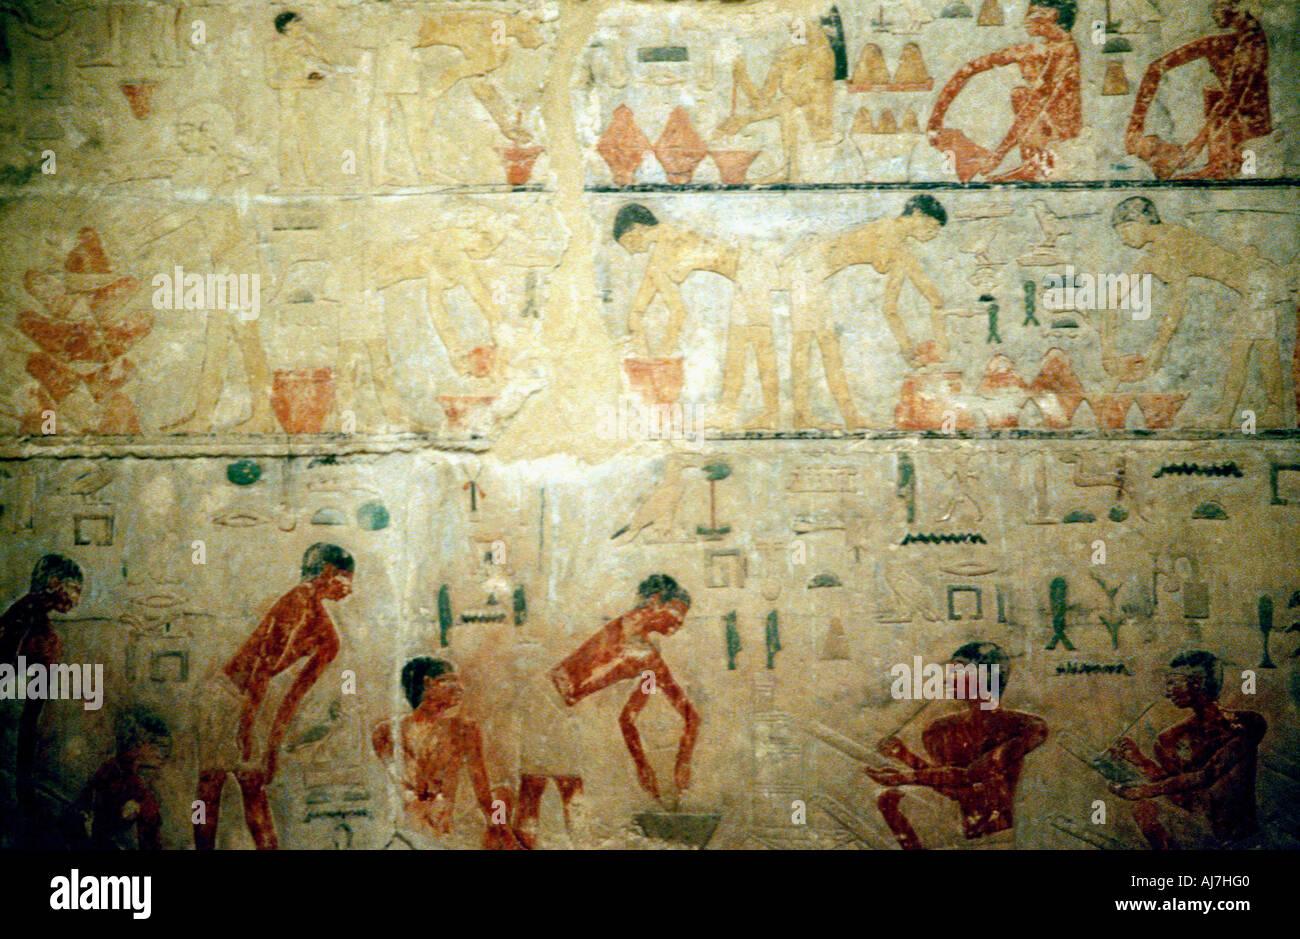 Artisan History